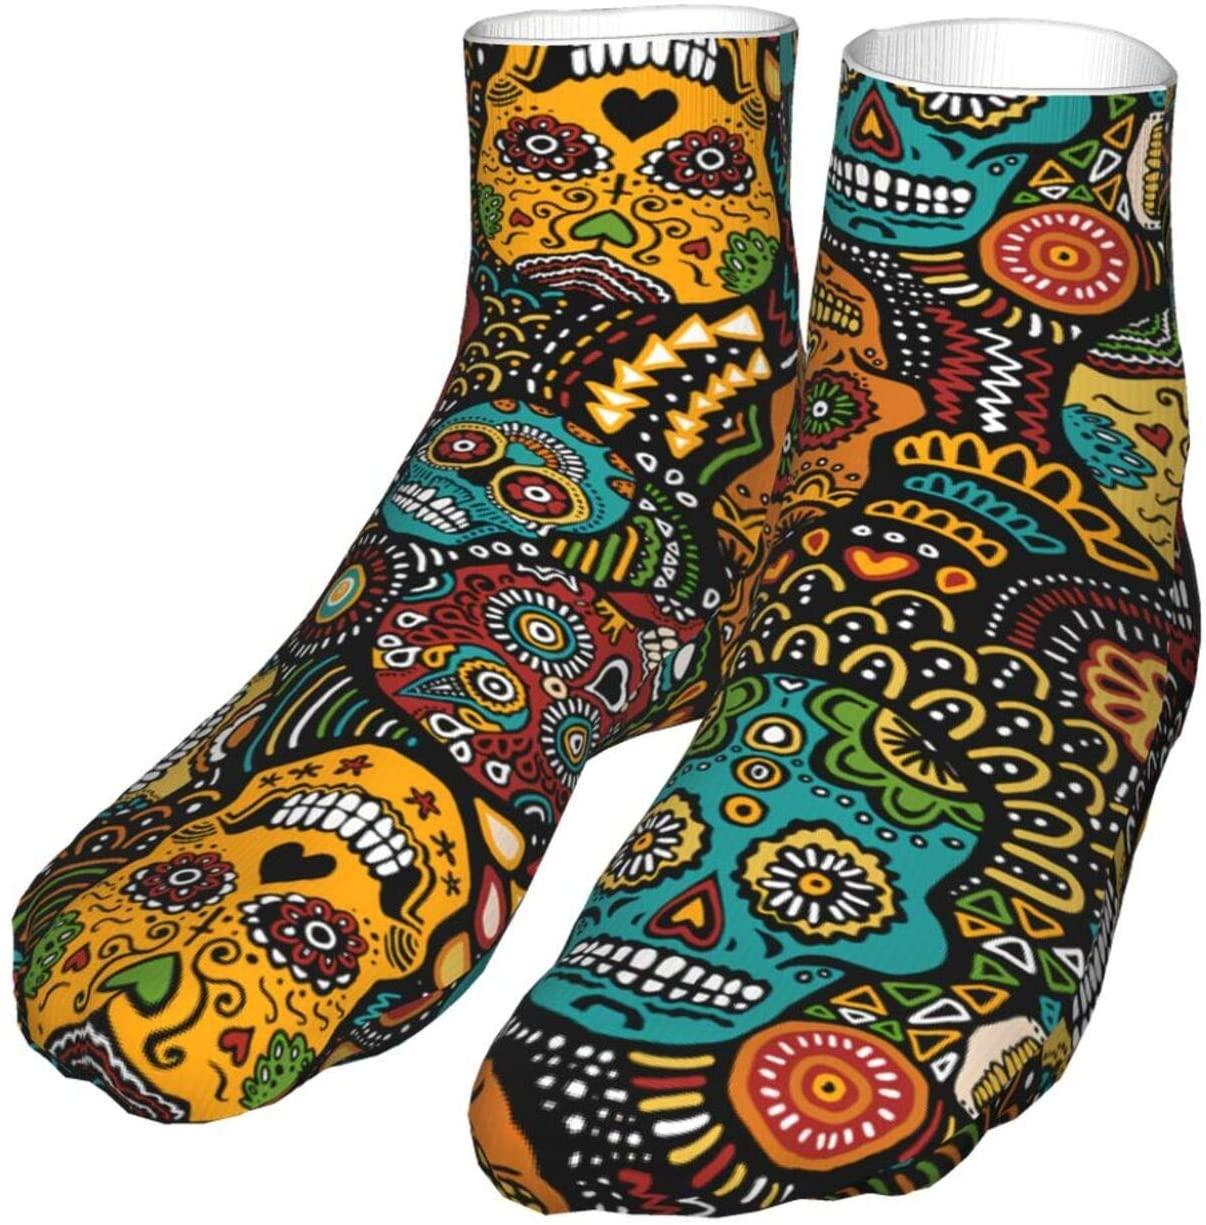 antcreptson Mexican Sugar Skulls Sugar Skulls Athletic Hiking Crew Socks Womens Mens Socks Soft Thick Cozy Warm Casual Compression Socks